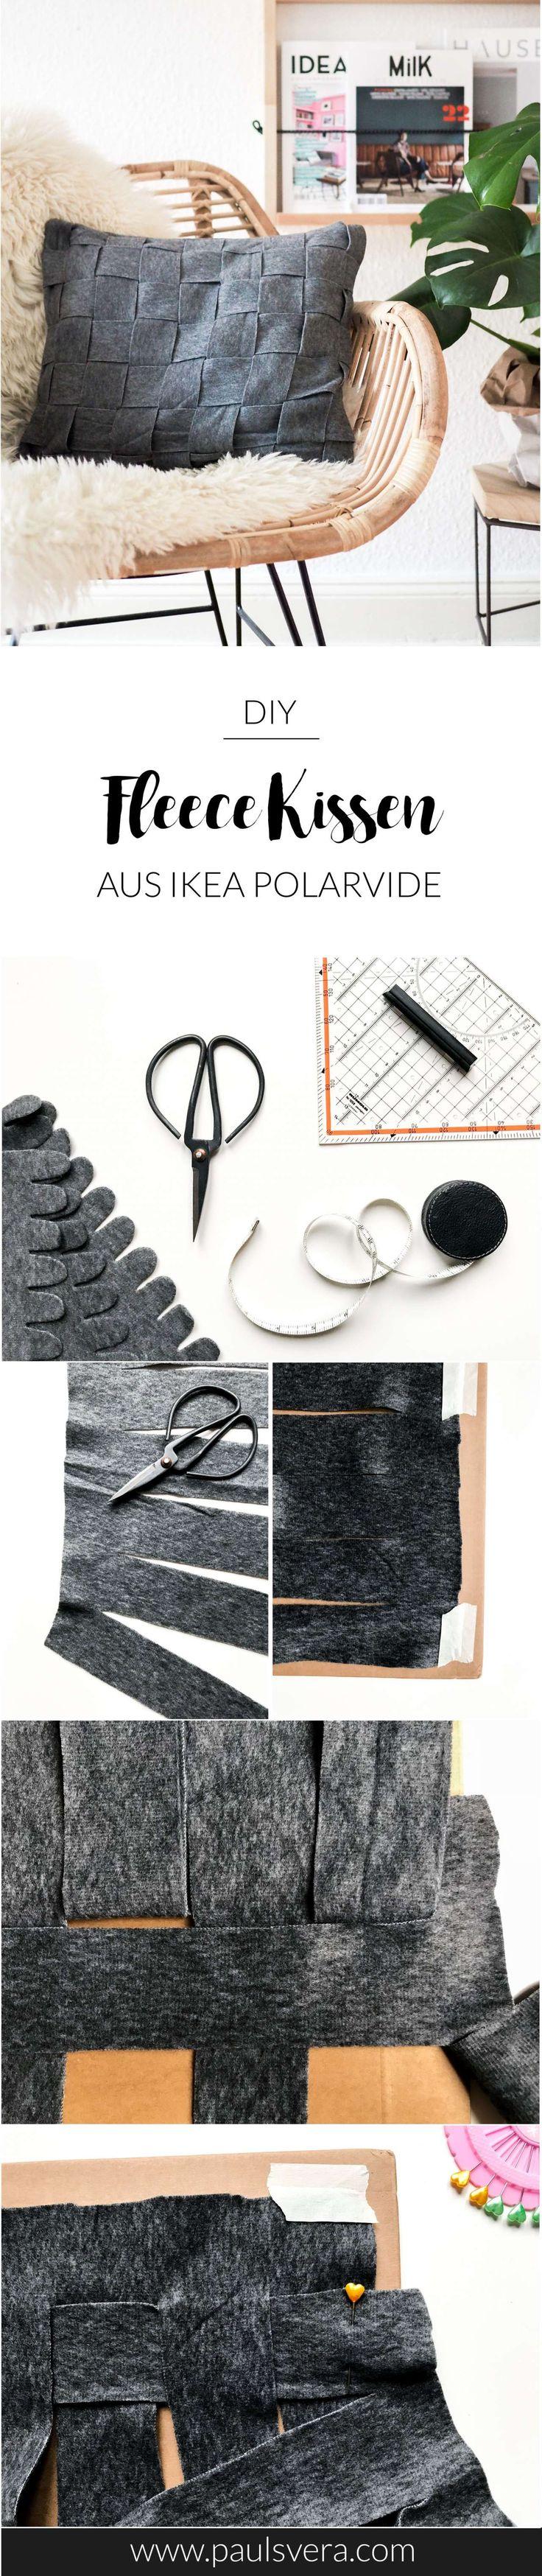 best 25 diy cushion ideas on pinterest diy cushion. Black Bedroom Furniture Sets. Home Design Ideas